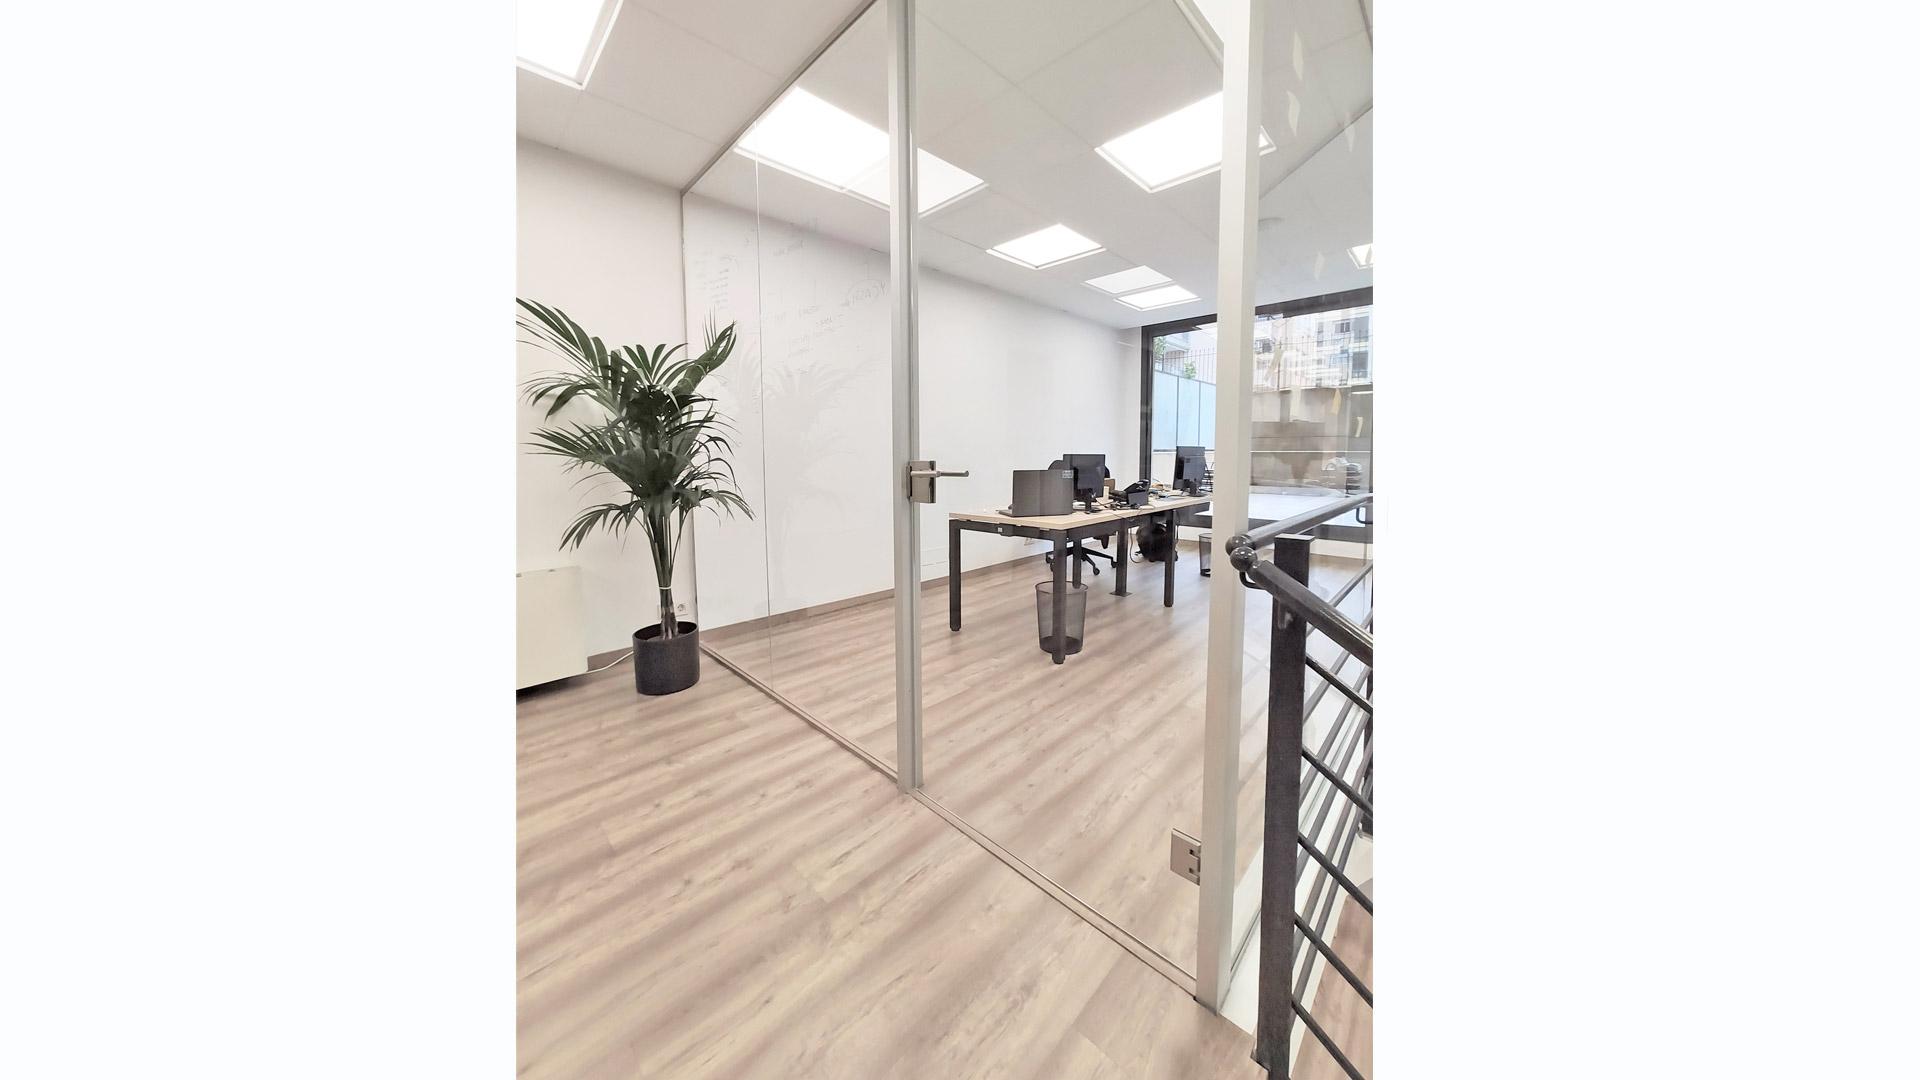 atelier4-anna-junca-interiorista-oficines-showroom-edyma-20-web